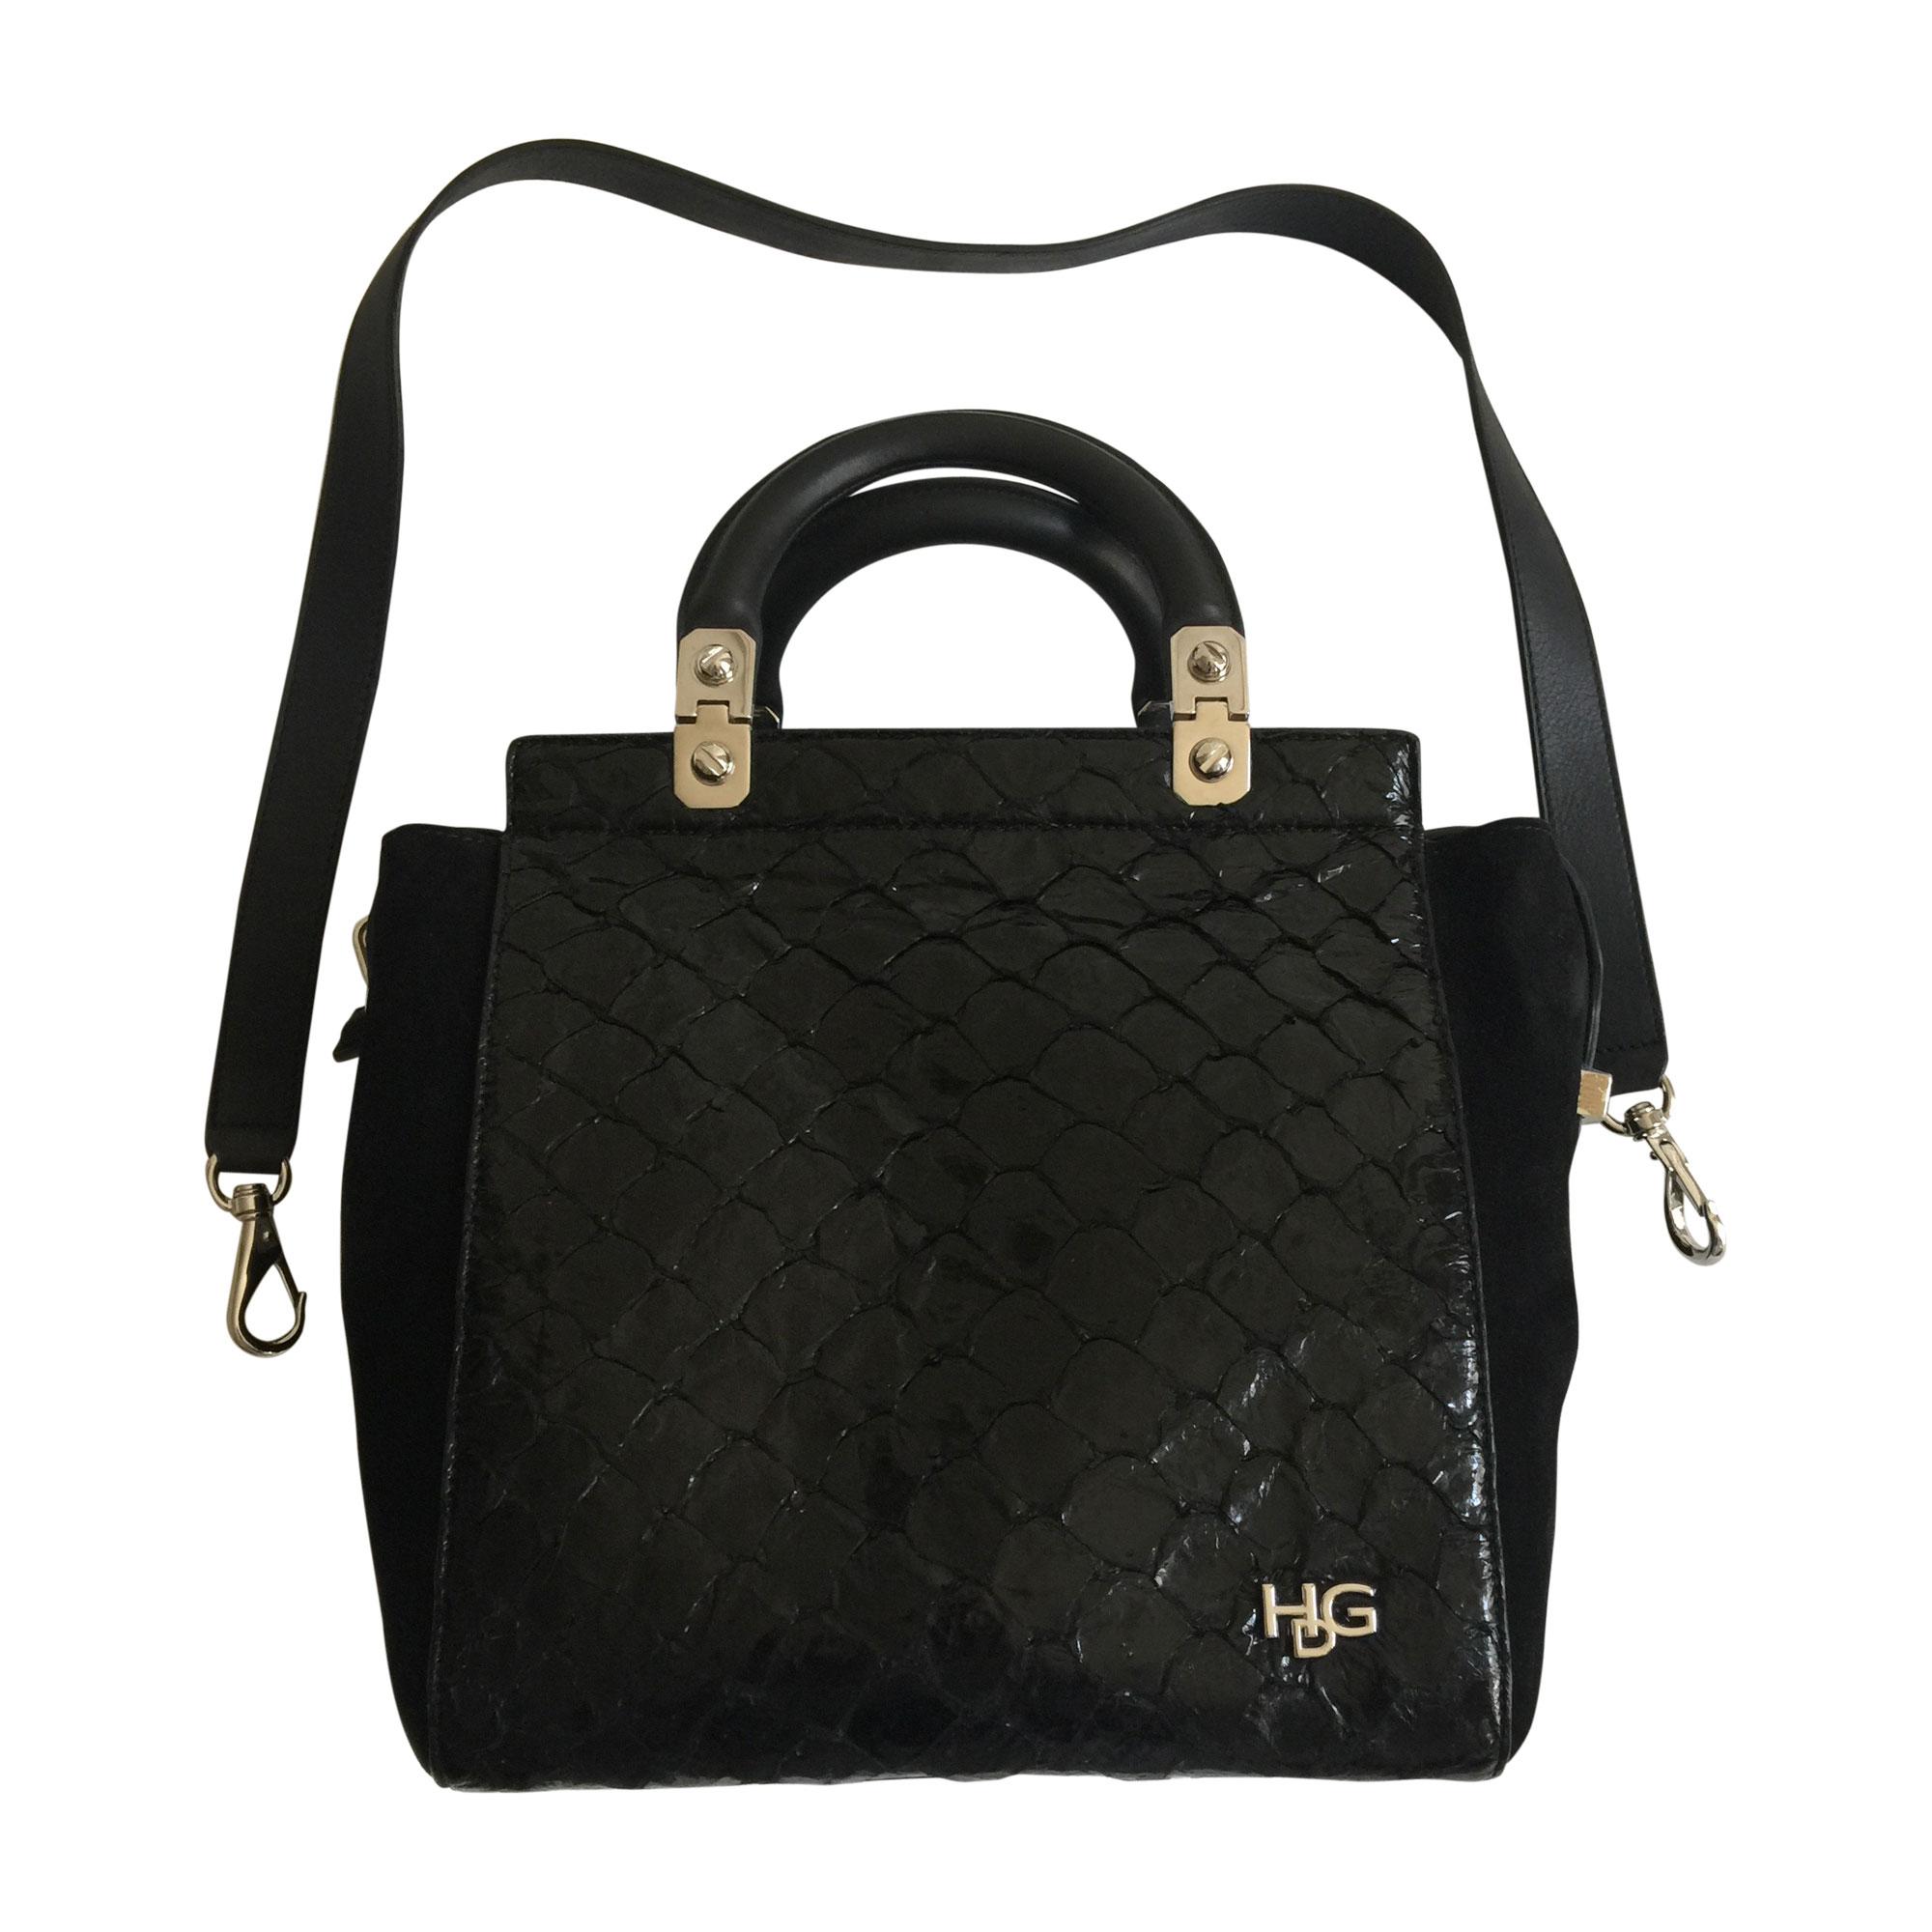 7711010 Givenchy Cuir Bandoulière Sac Noir En xWpgxFS